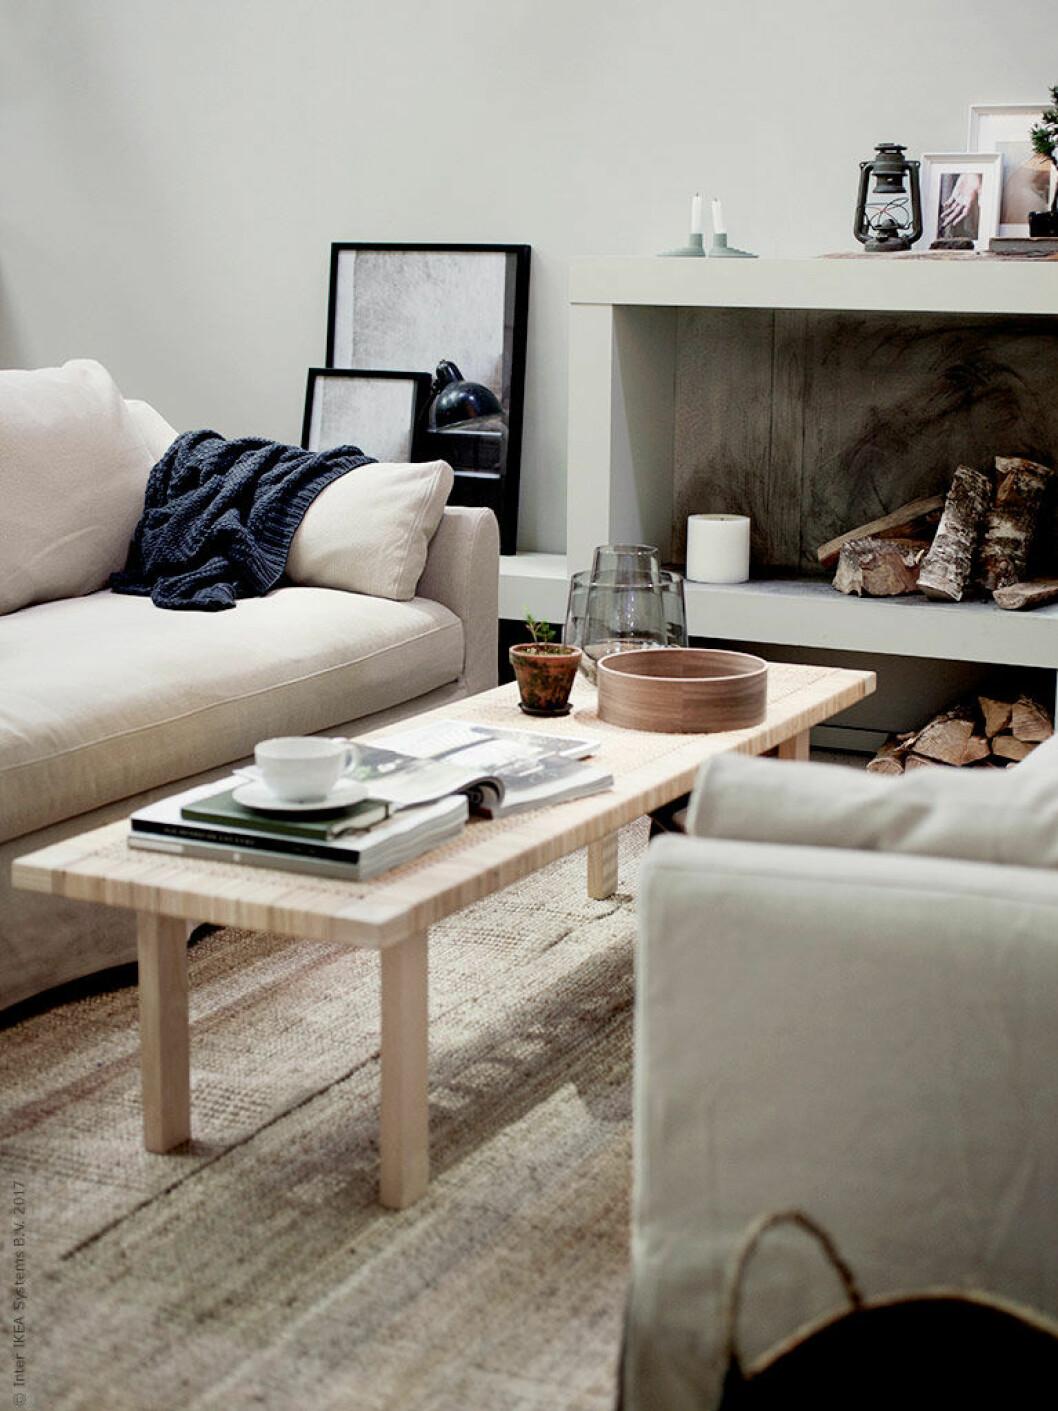 Lågt rektangulärt soffbord i trä